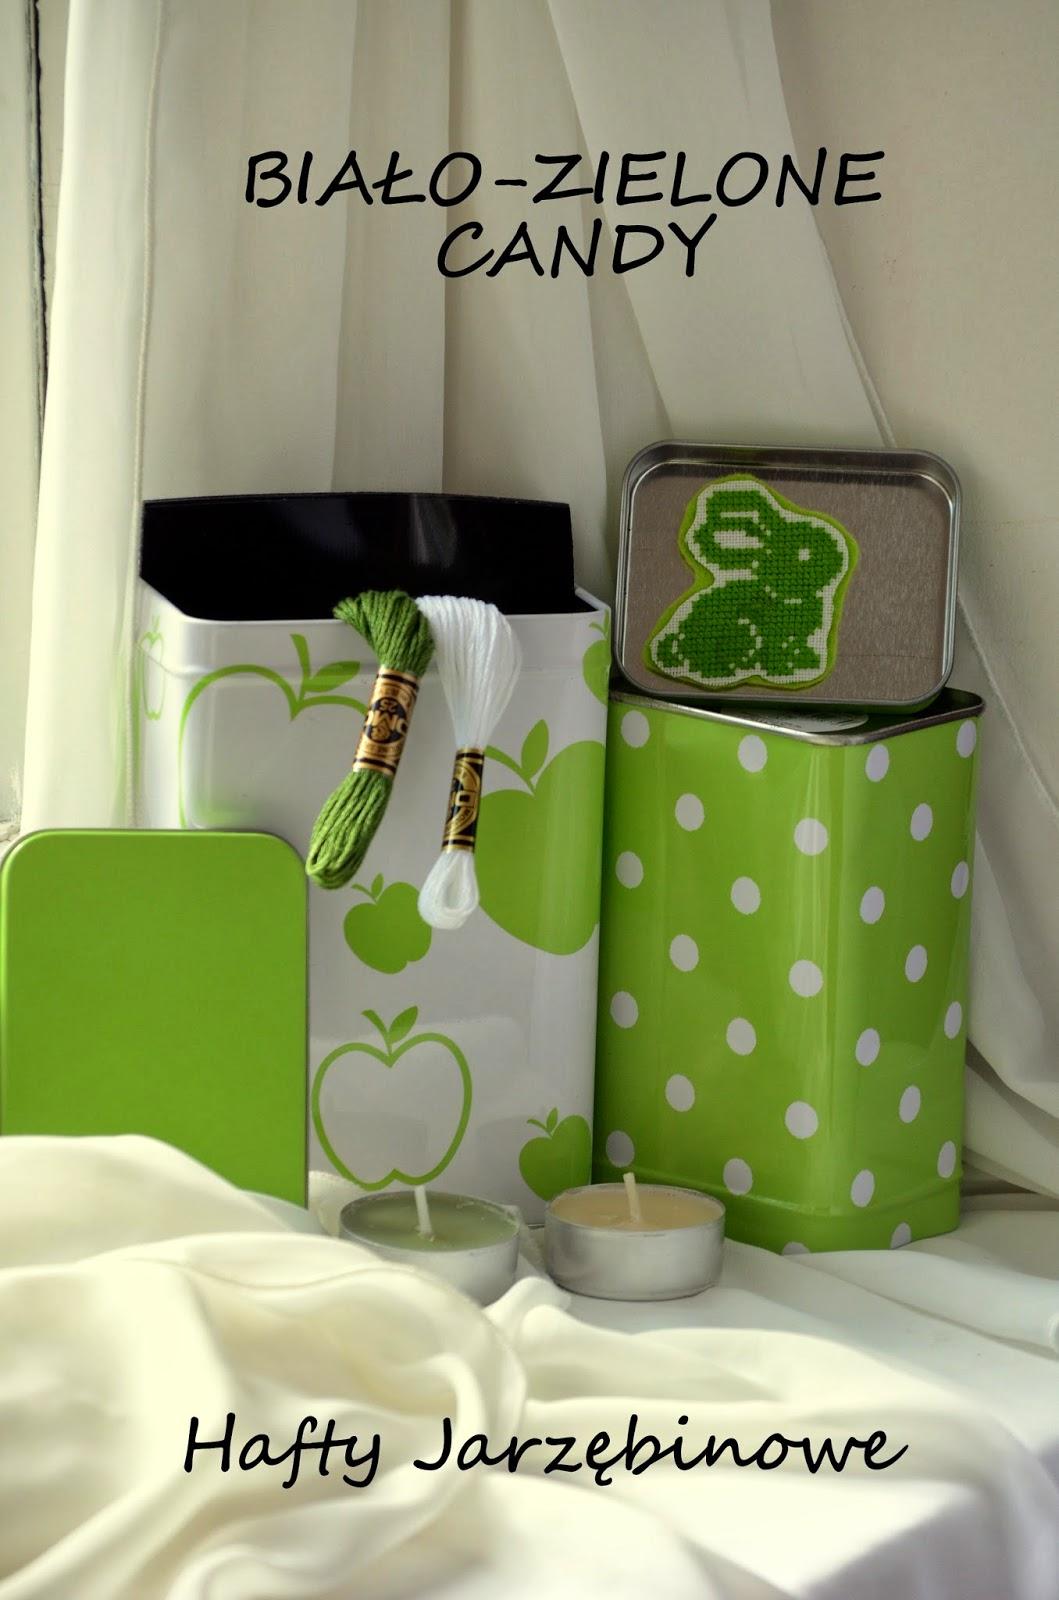 http://jarzebinowehafty.blogspot.com/2014/03/biao-zielone-candy.html?showComment=1396336368203#c4596537576871888575